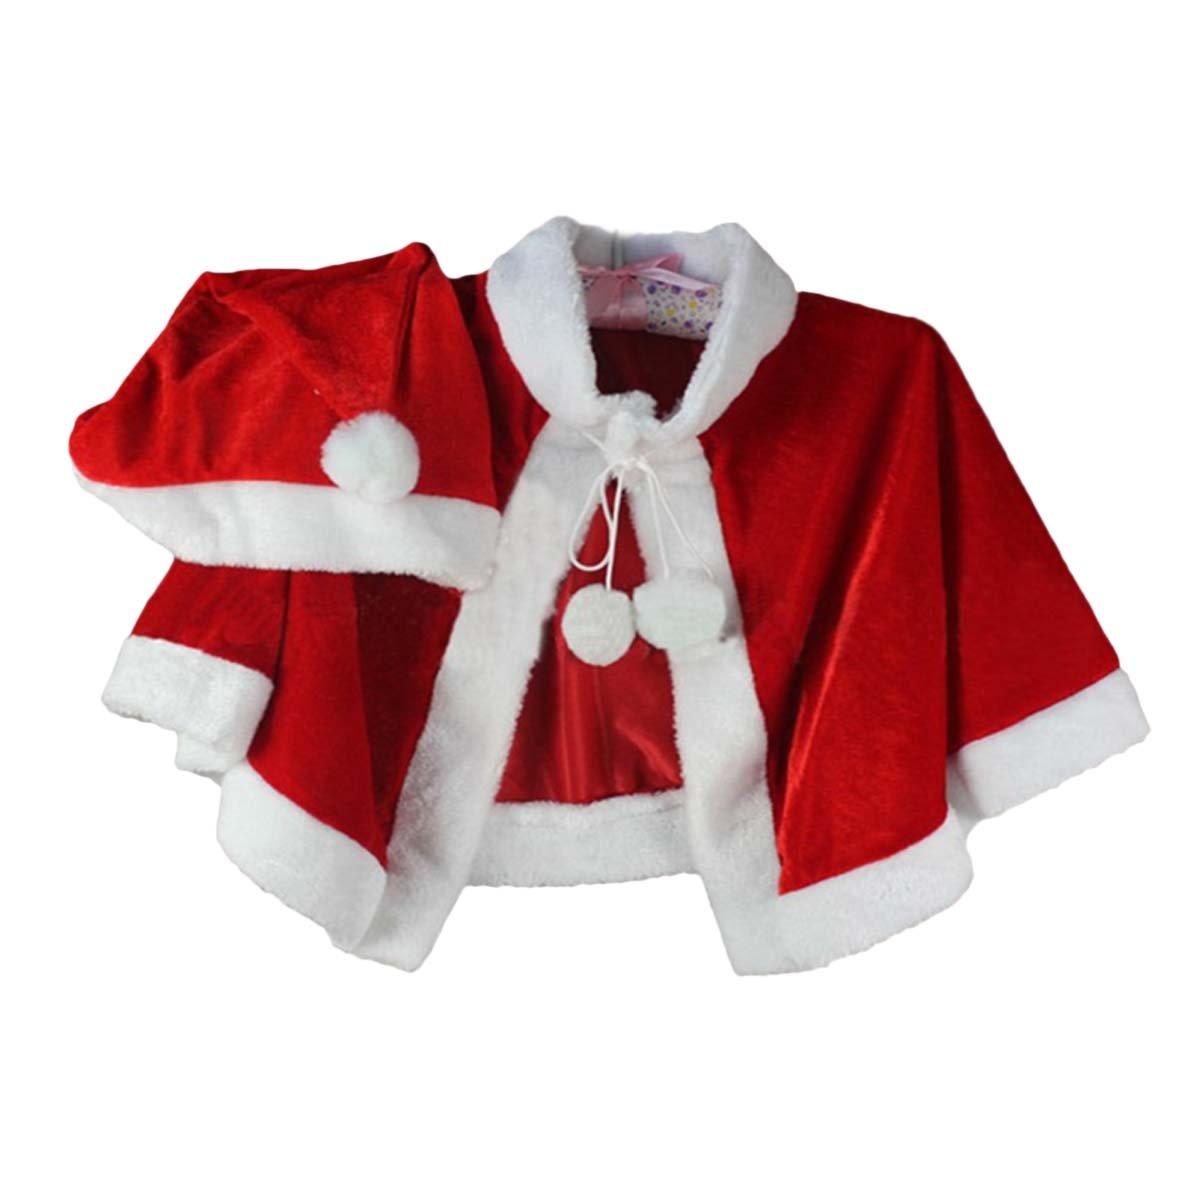 Fygood Capa roja de terciopelo, disfraz infantil/adulto para Navidad Cape+ Bonnet Talla:Enfant/Longueur 41cm